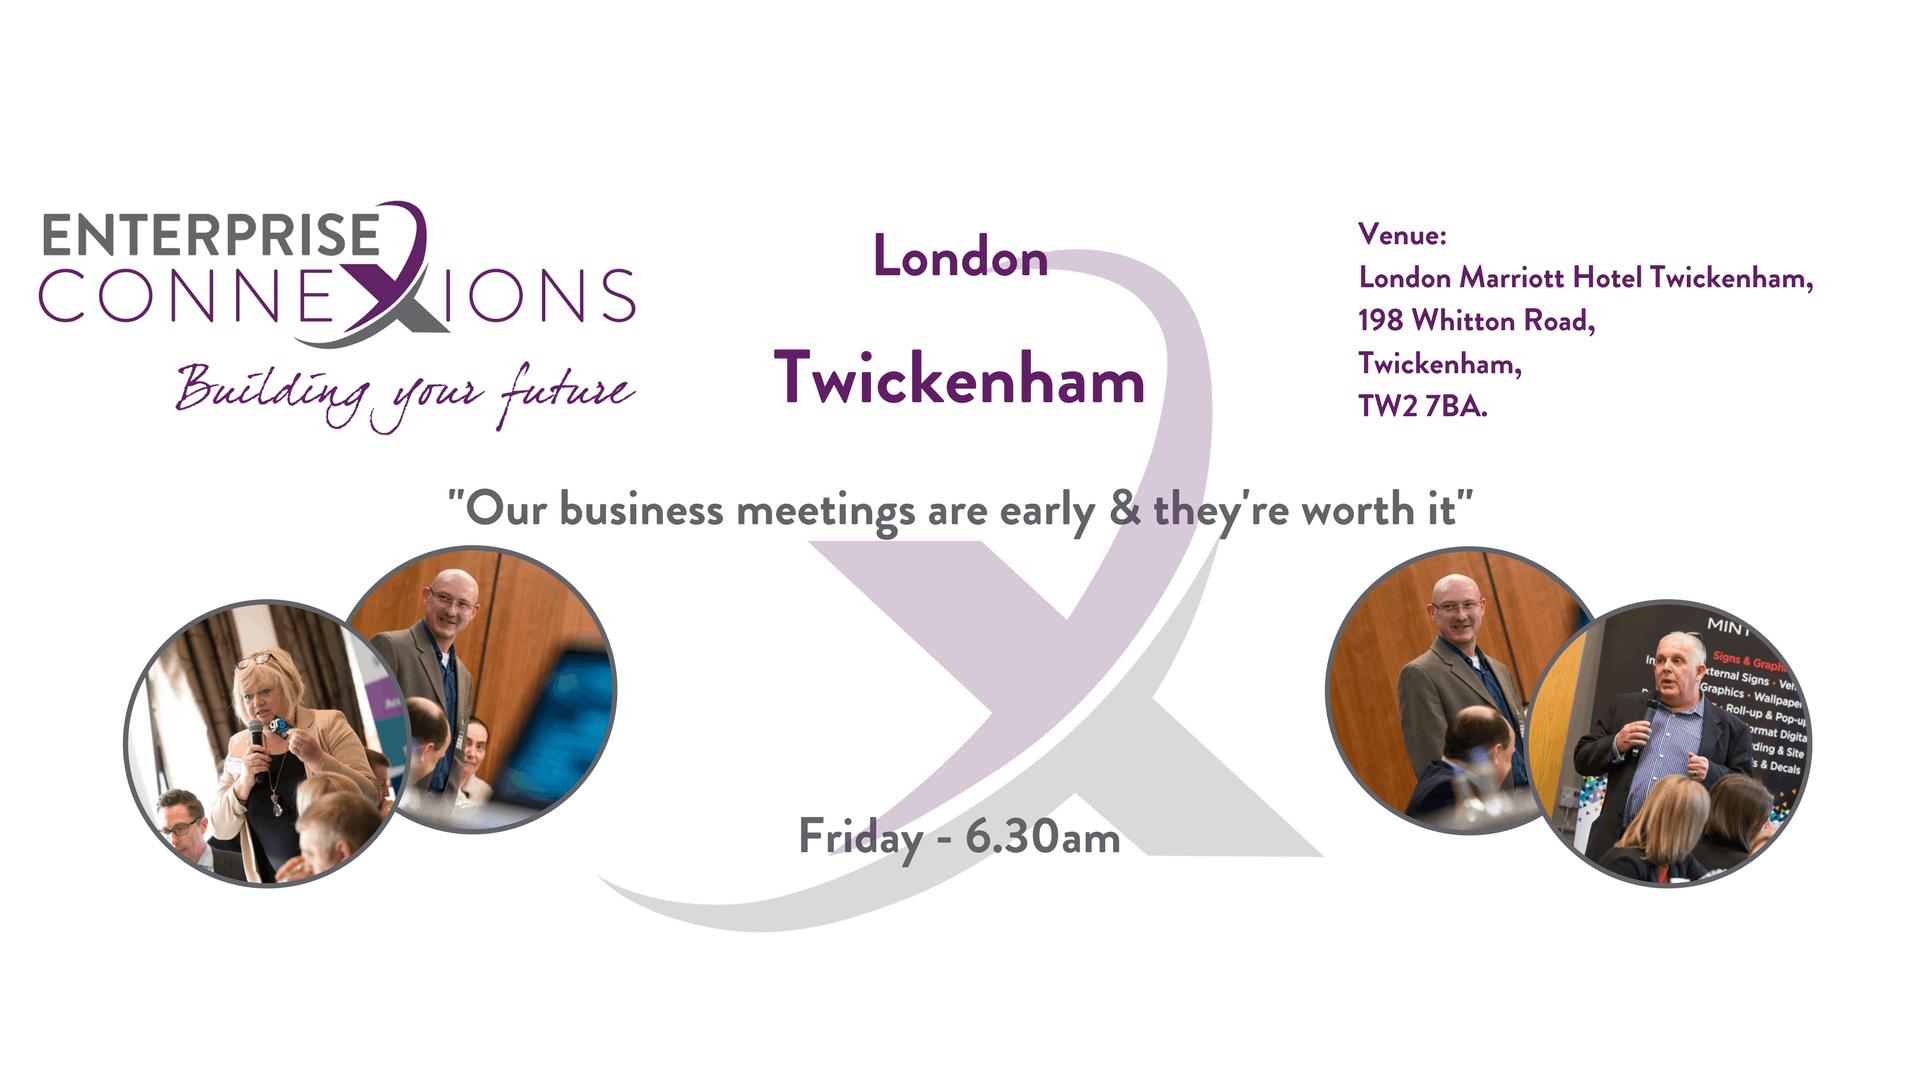 London Twickenham - Enterprise Connexions